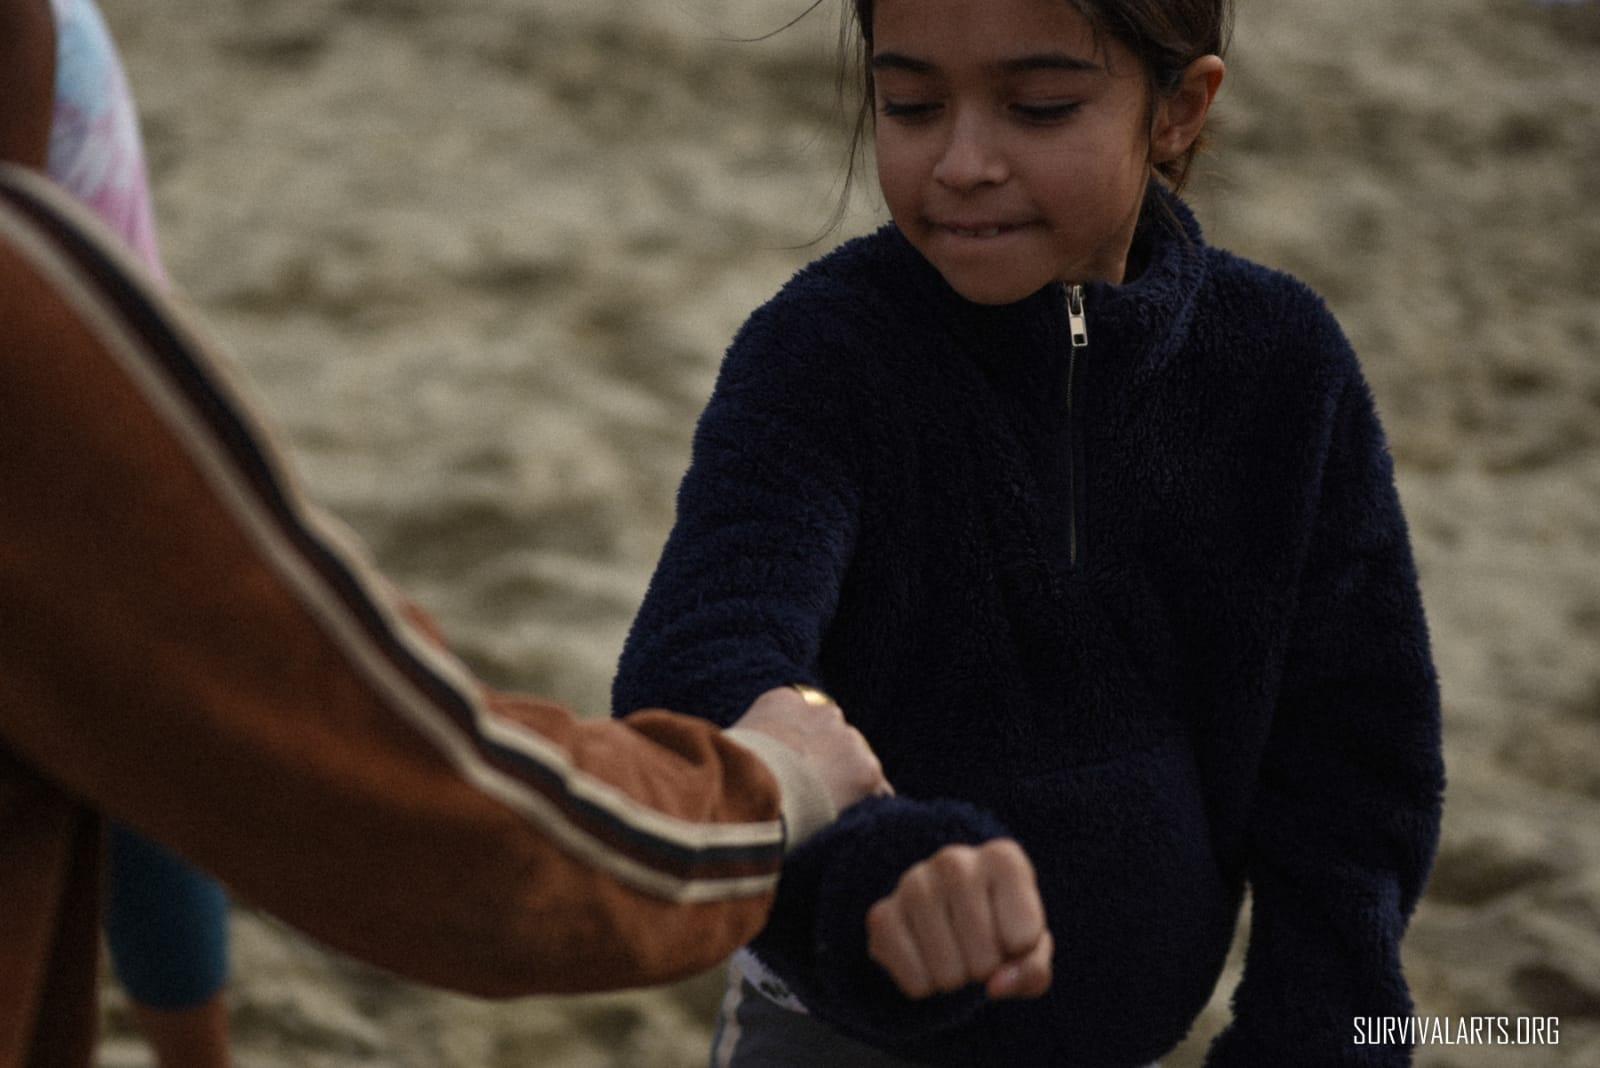 Survival Arts Arm Grab Response Training for Girls.jpg